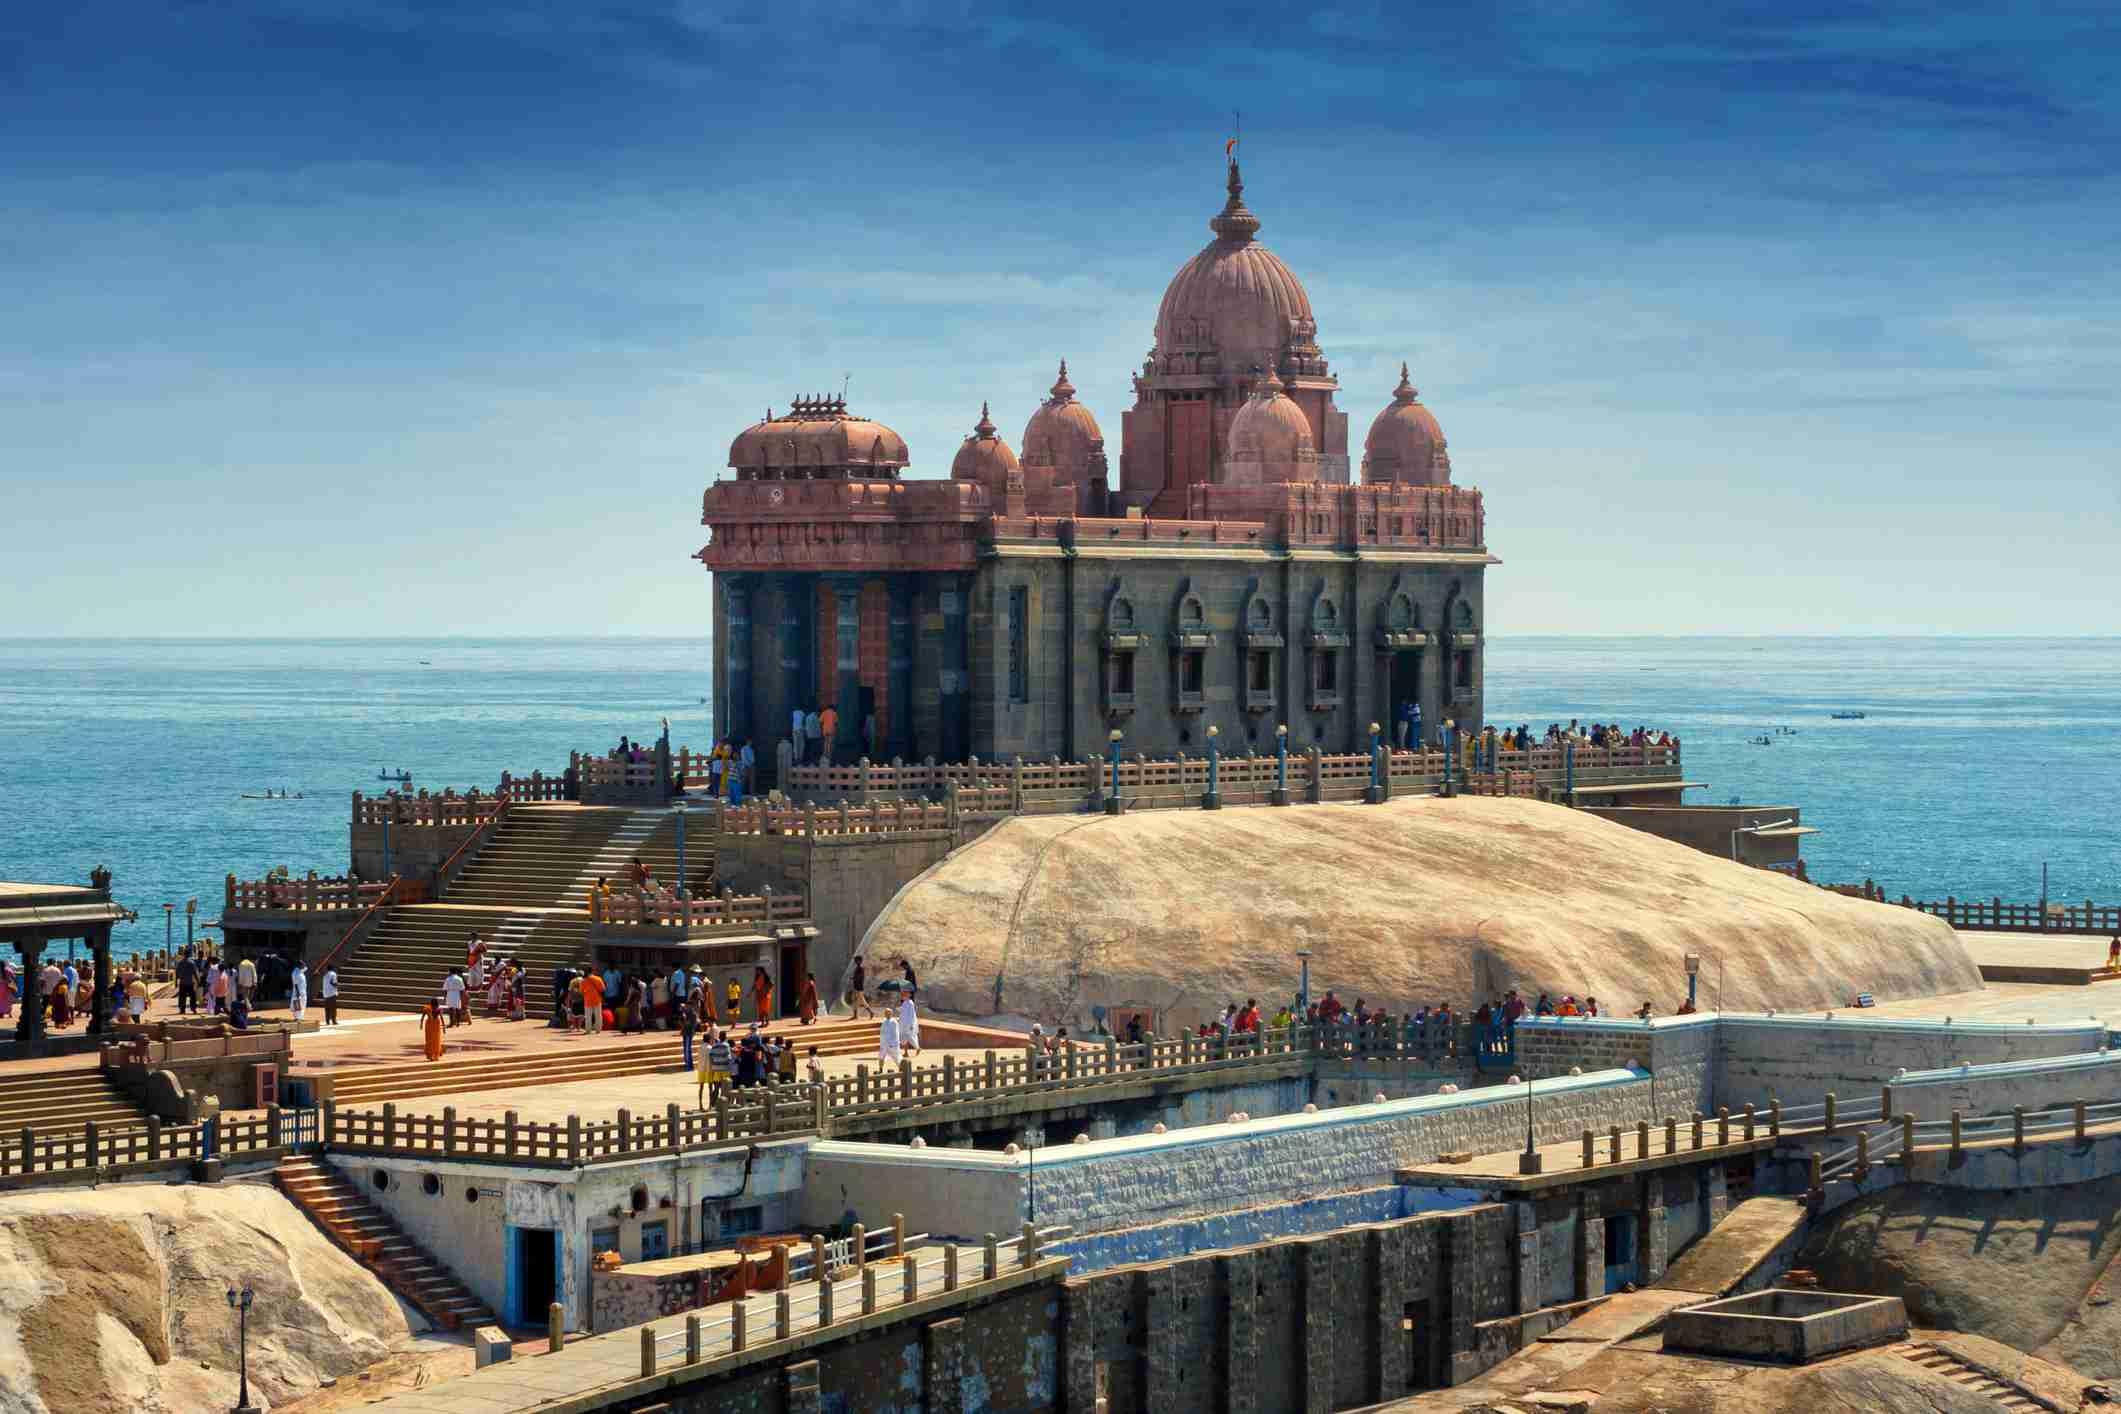 Swami Vivekananda Memorial center situated on a small rock island in Kanyakumari, India